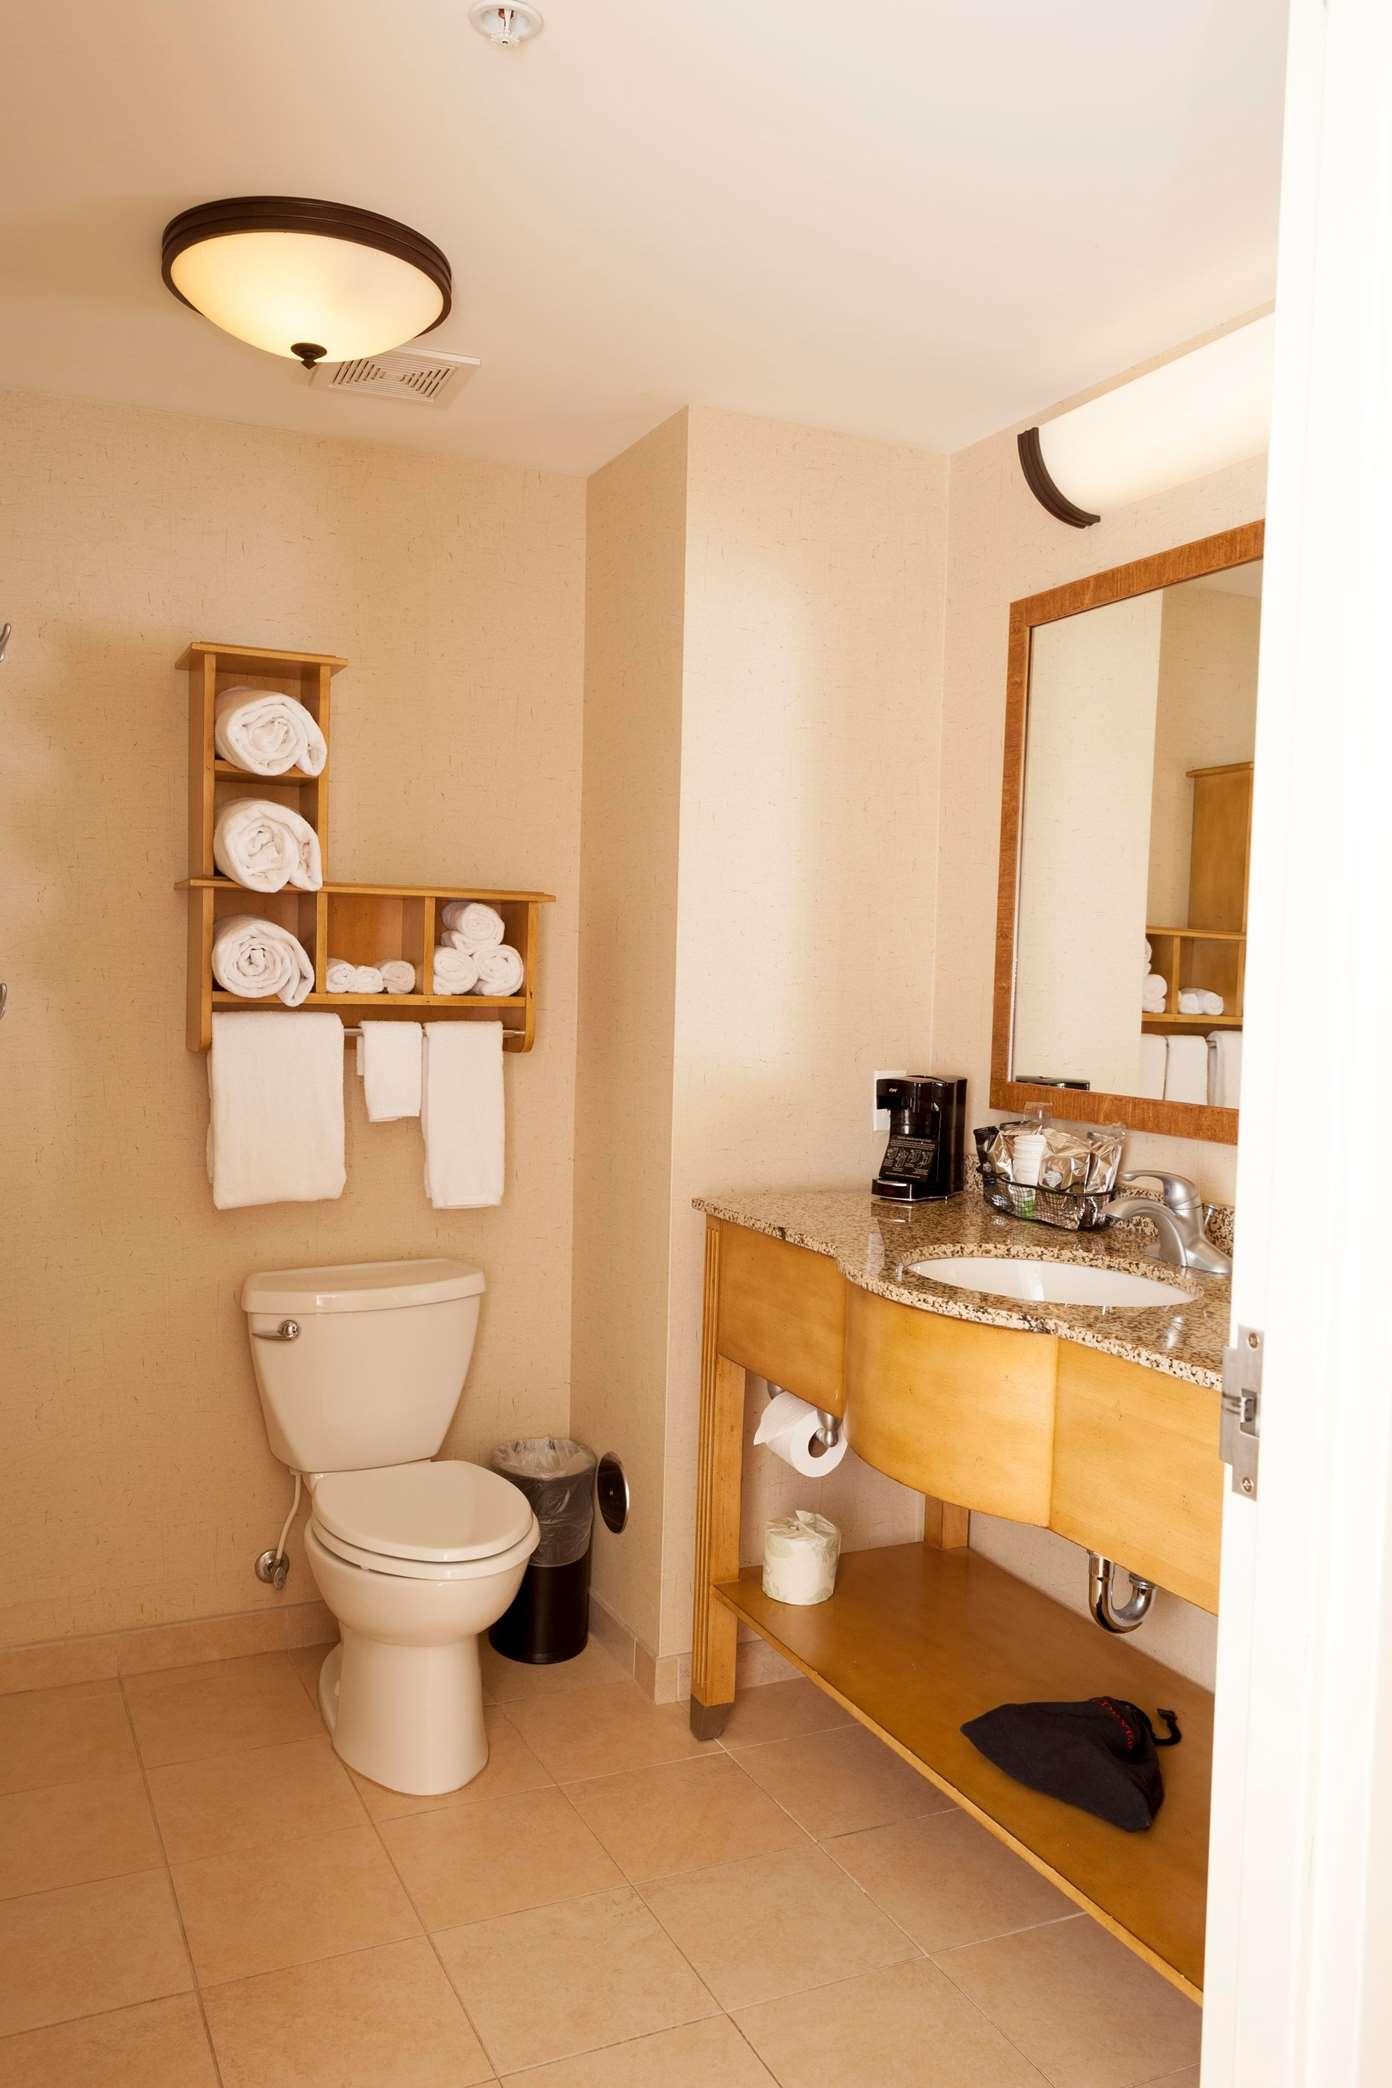 Hampton Inn & Suites Riverton image 6